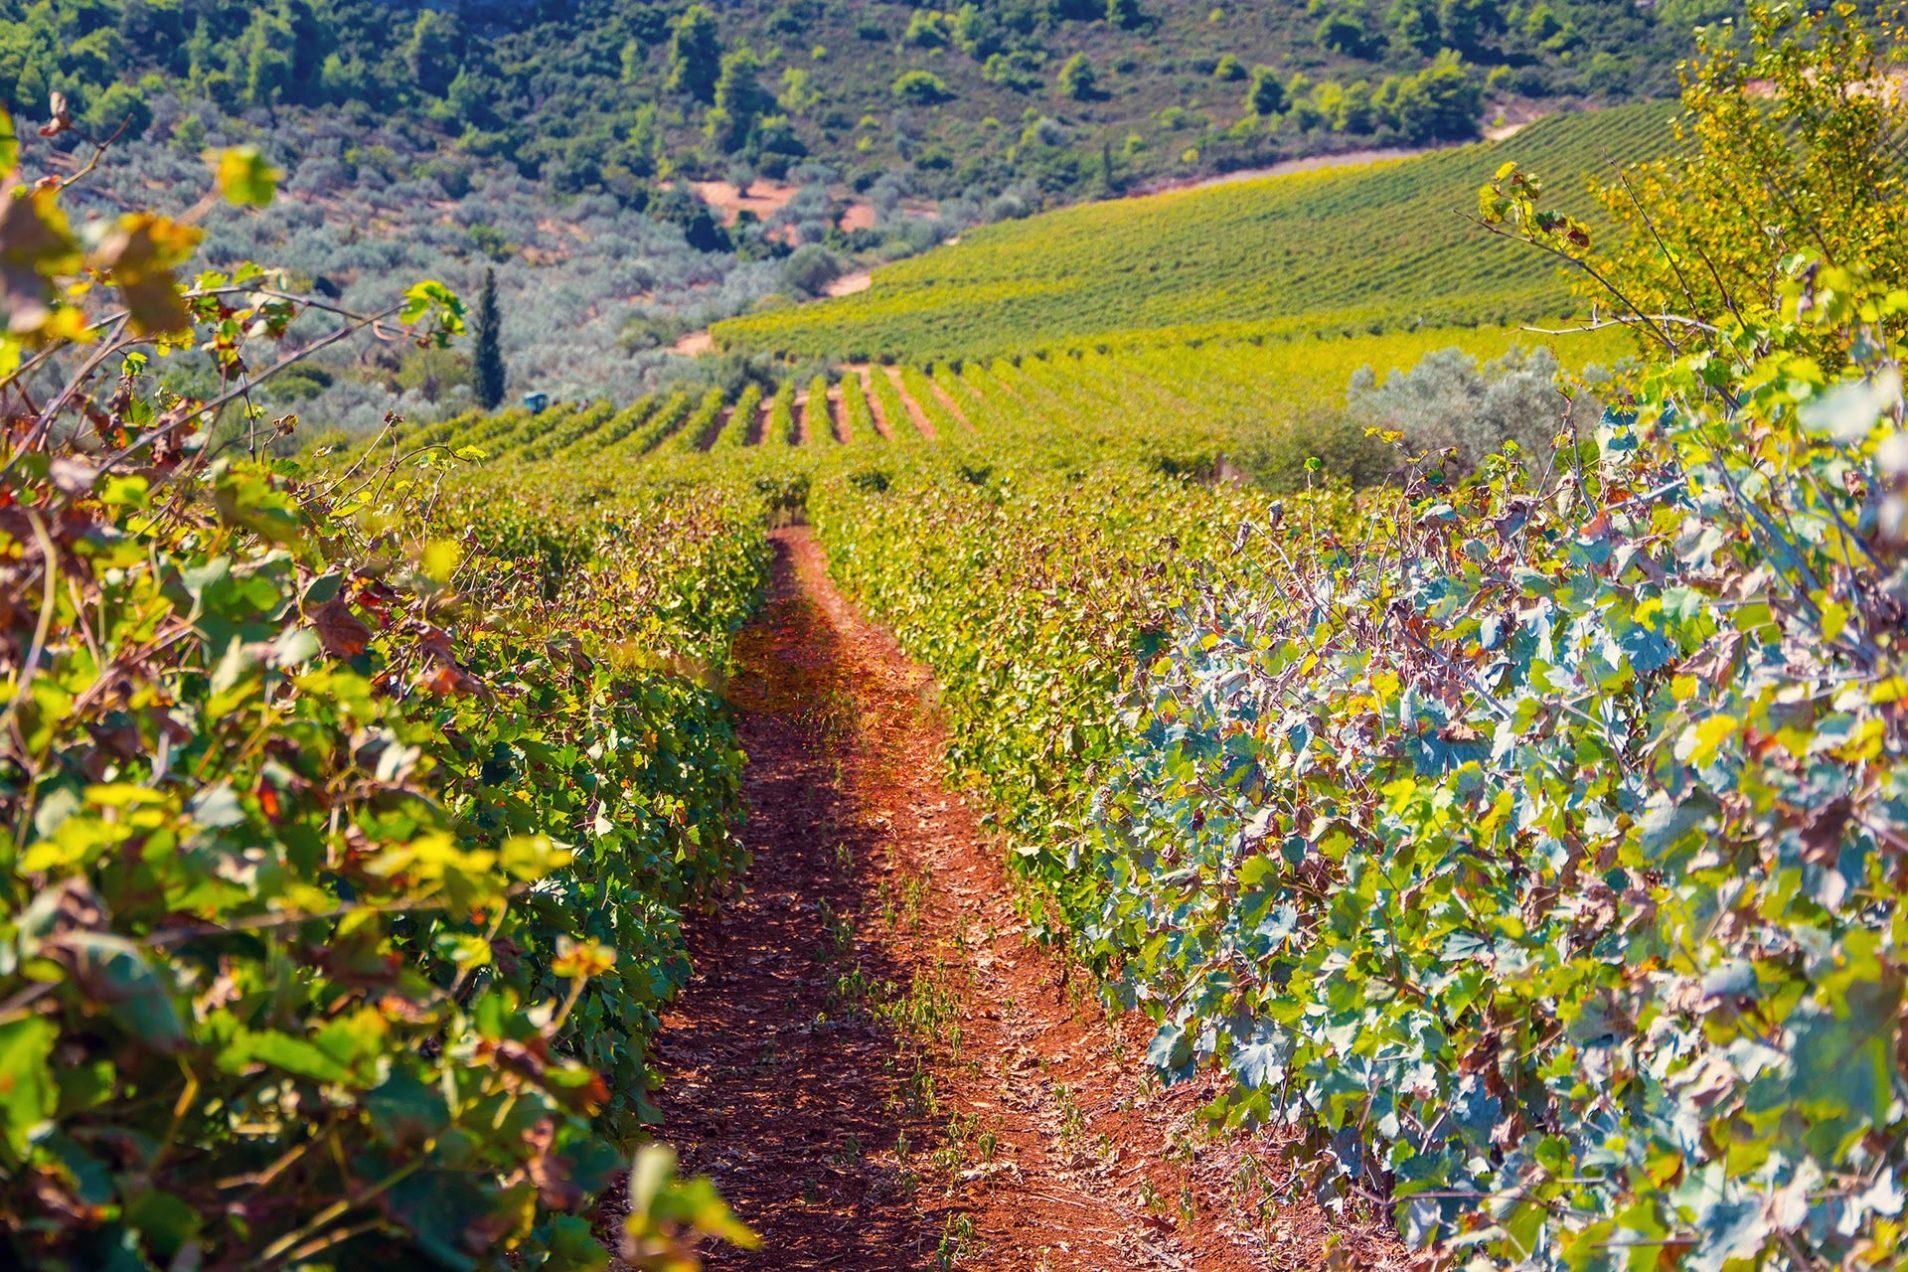 LUXURY WINE FOOD TOUR IN GREECE, VISIT NAFPLIO